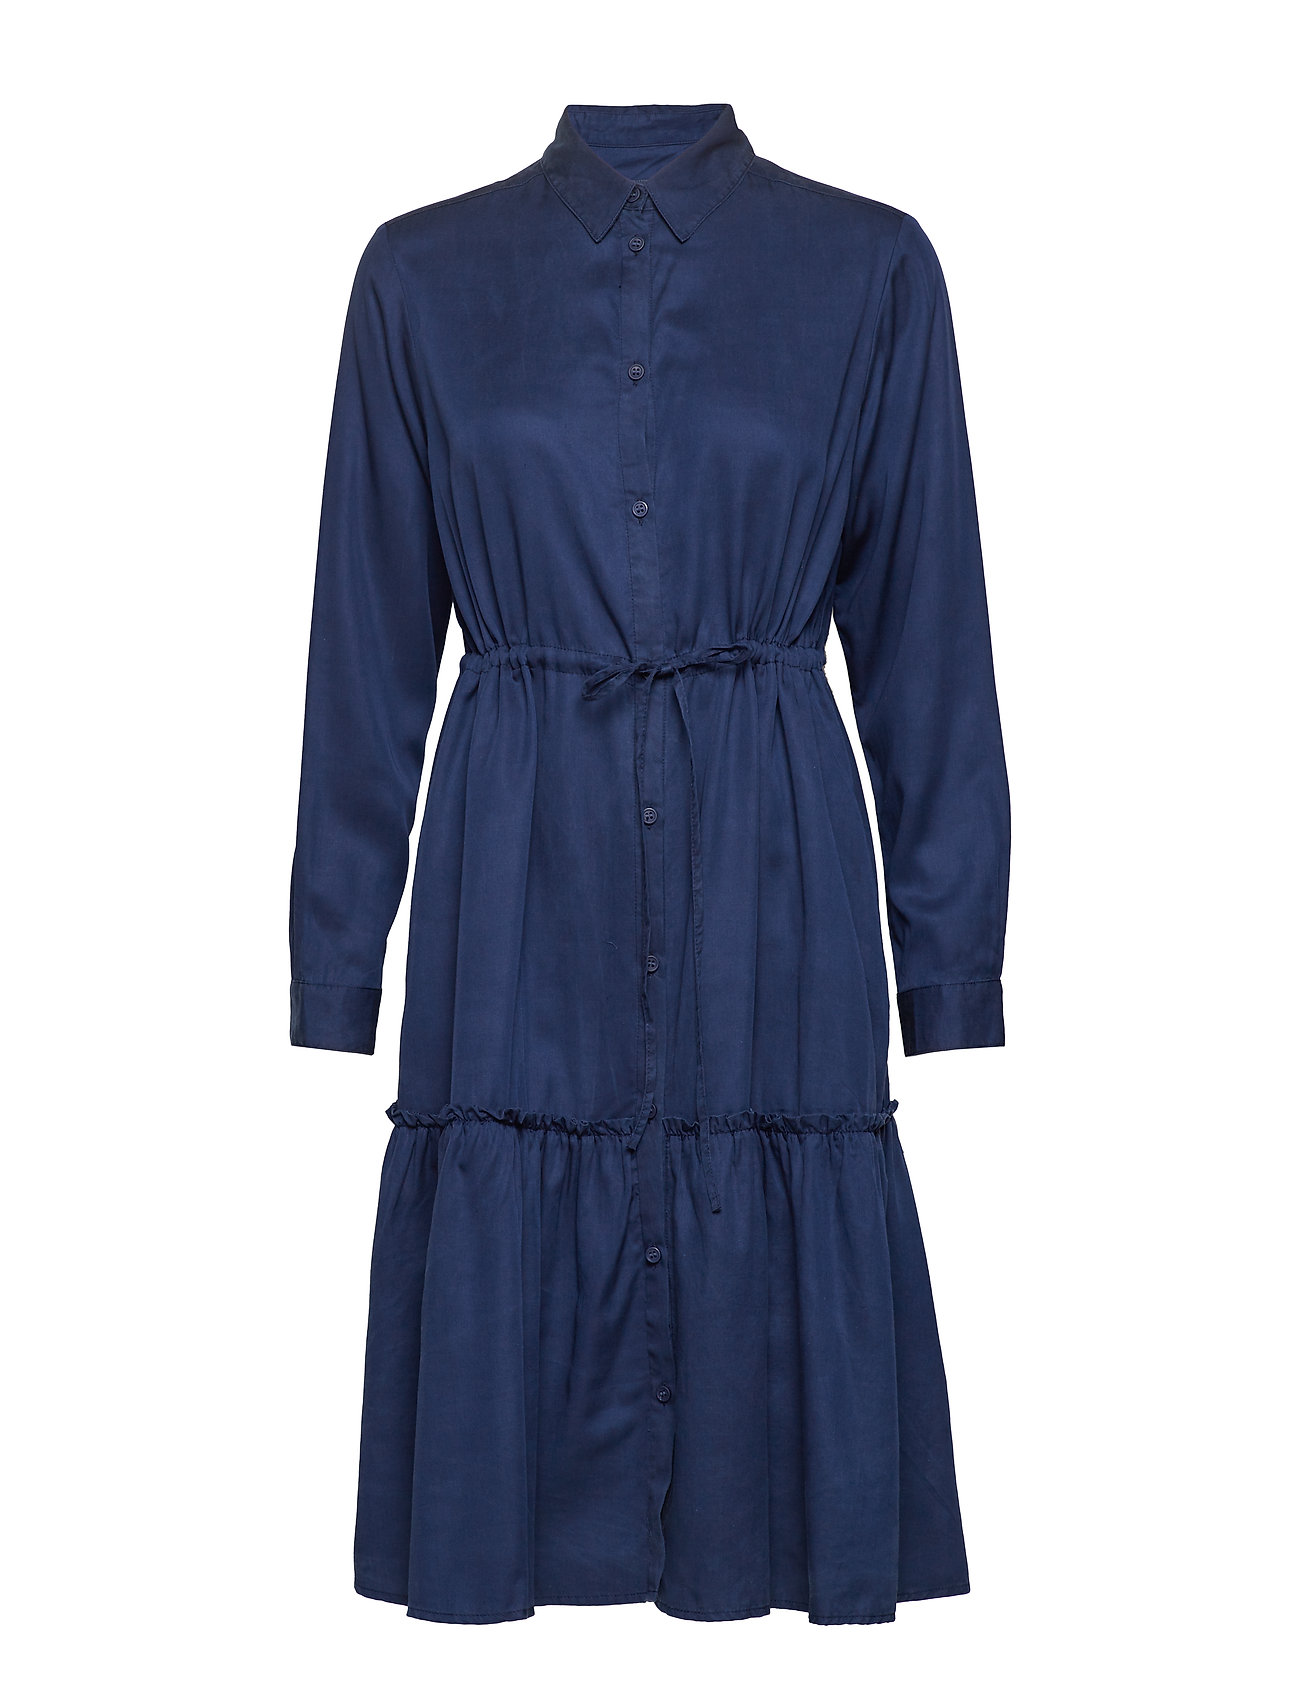 French Connection FLORETA DRAPE TIERED SHIRT DRESS - INDIGO